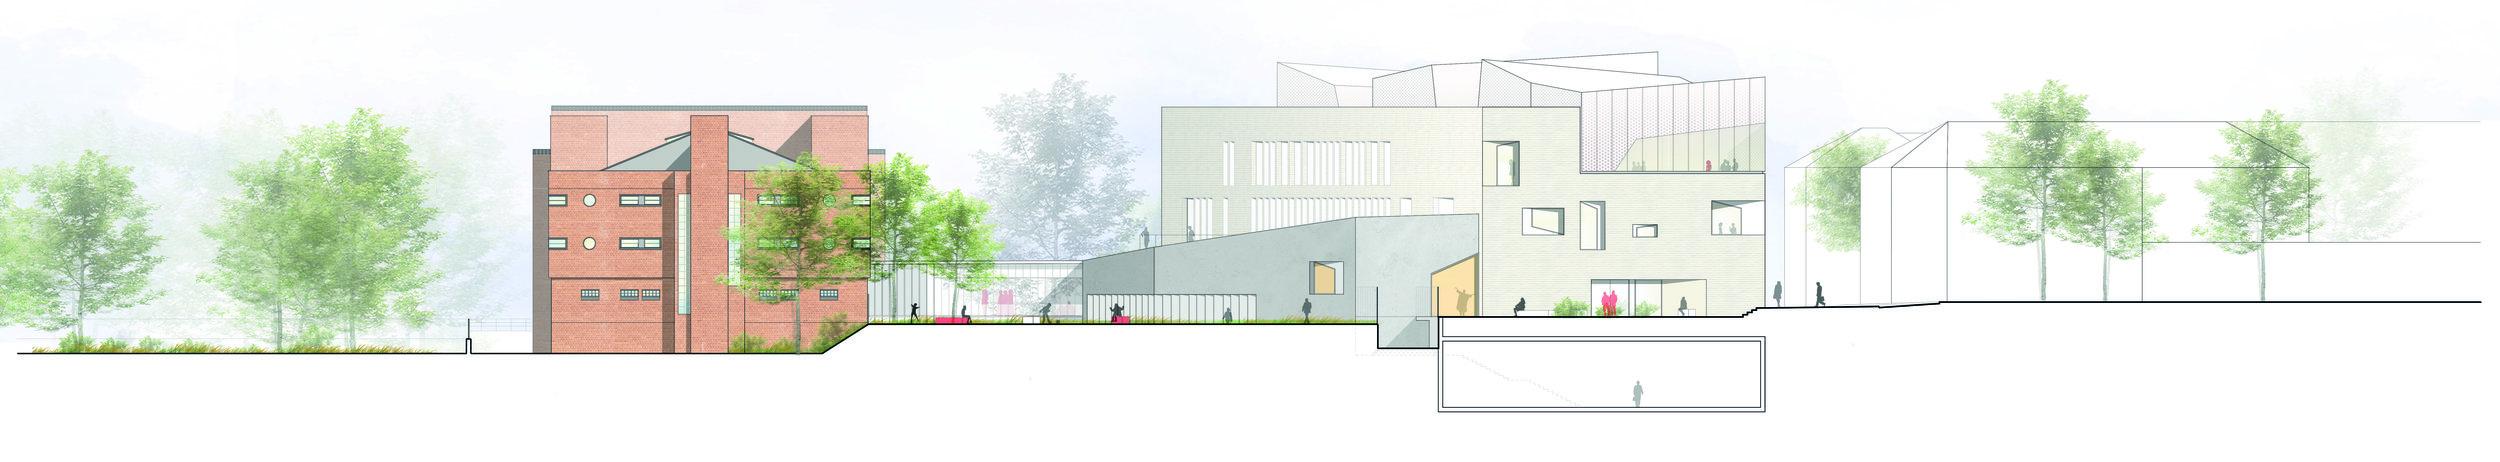 conservatoire_piscine_leclerc_pantin_public_outdoor_design_christophe_gautrand_paysagiste_7.jpg